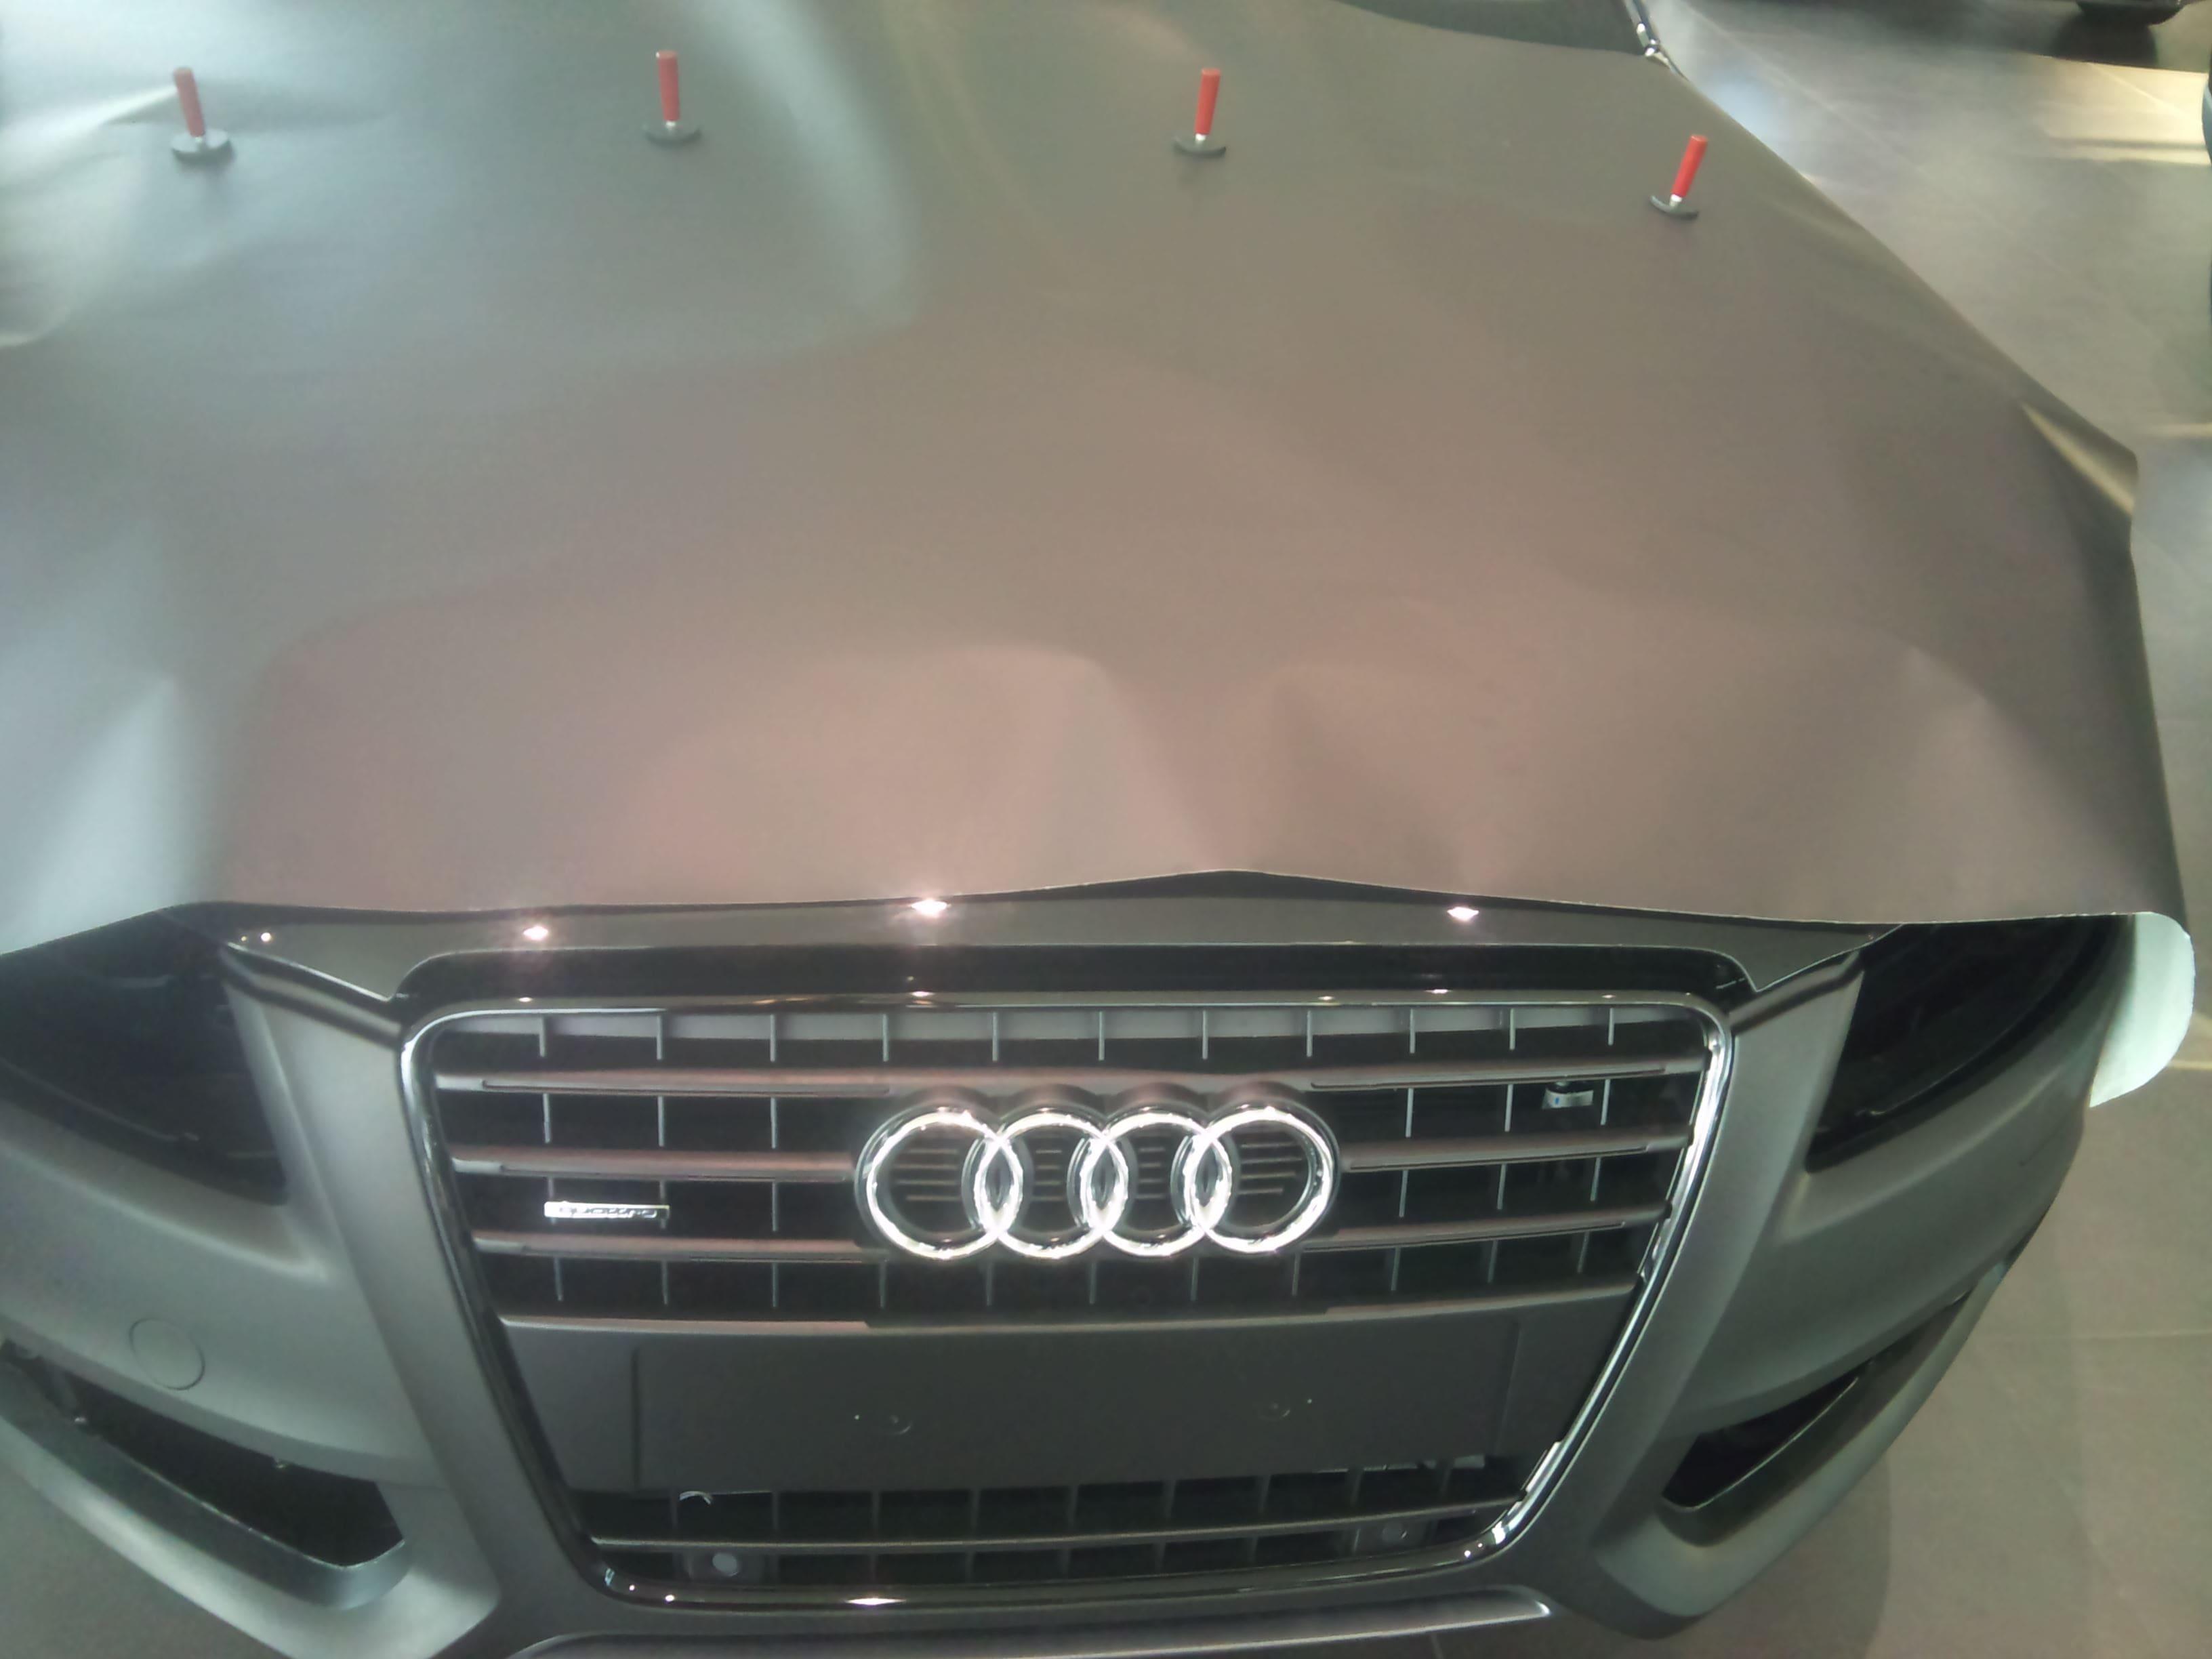 Audi A5 Coupe met Mat Zwarte Wrap, Carwrapping door Wrapmyride.nu Foto-nr:4558, ©2021